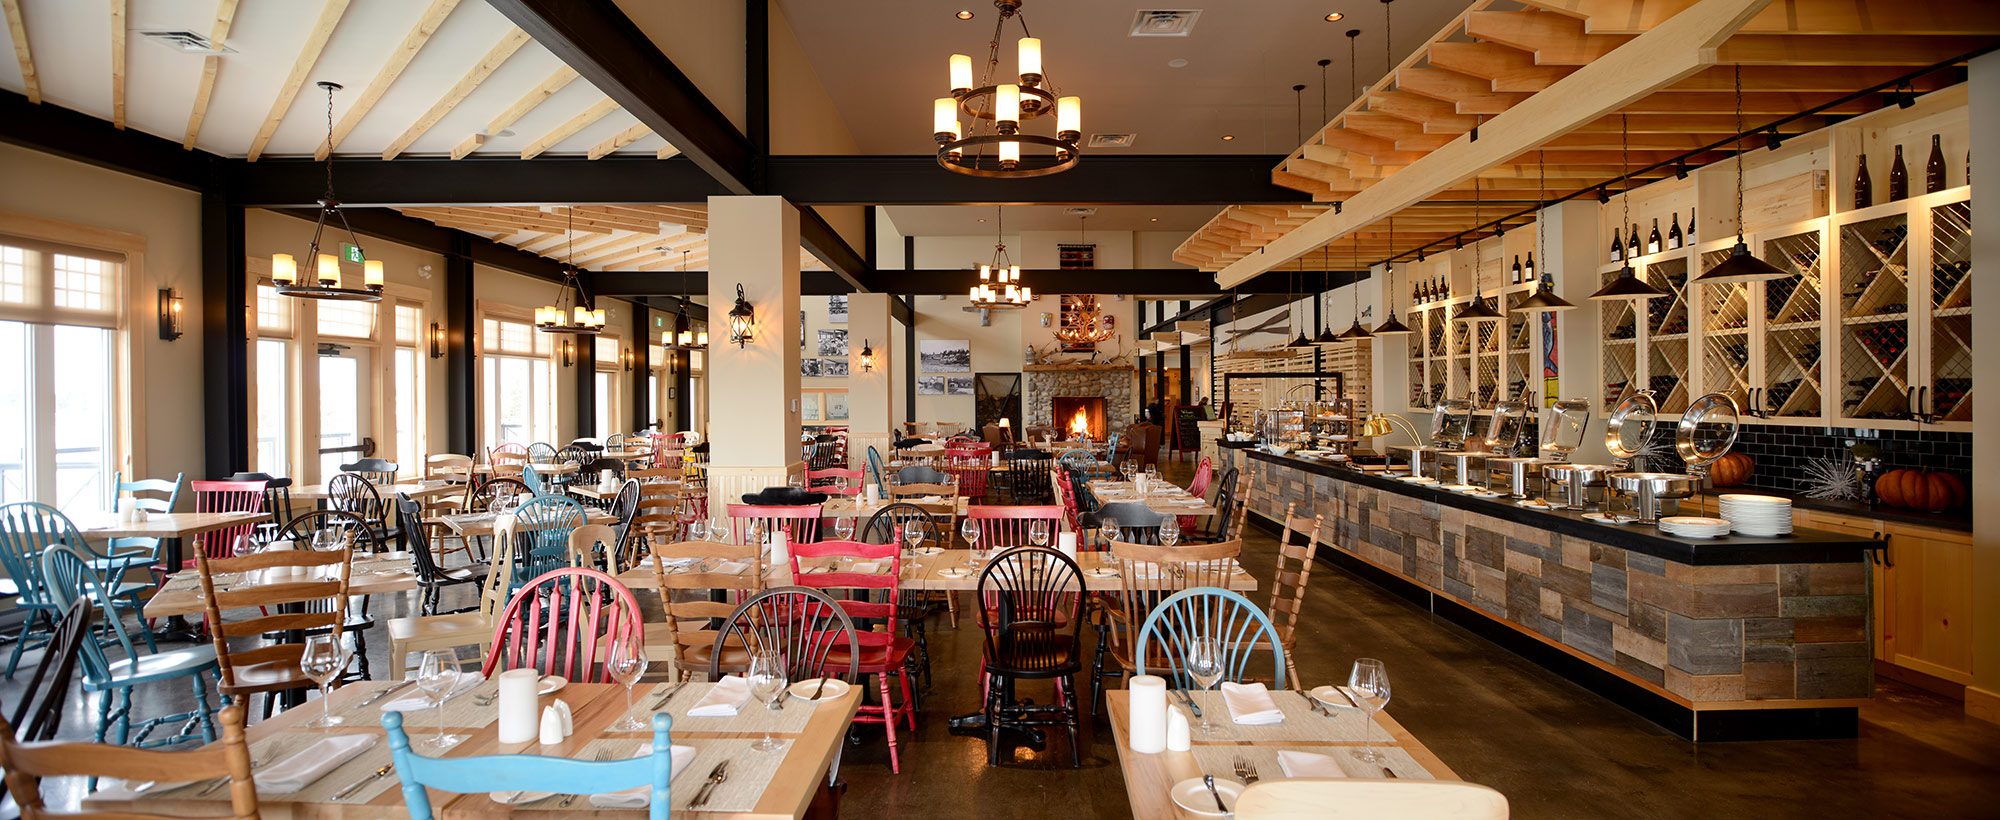 interior-design-restuarant-nova-scotia-dining-room.jpg